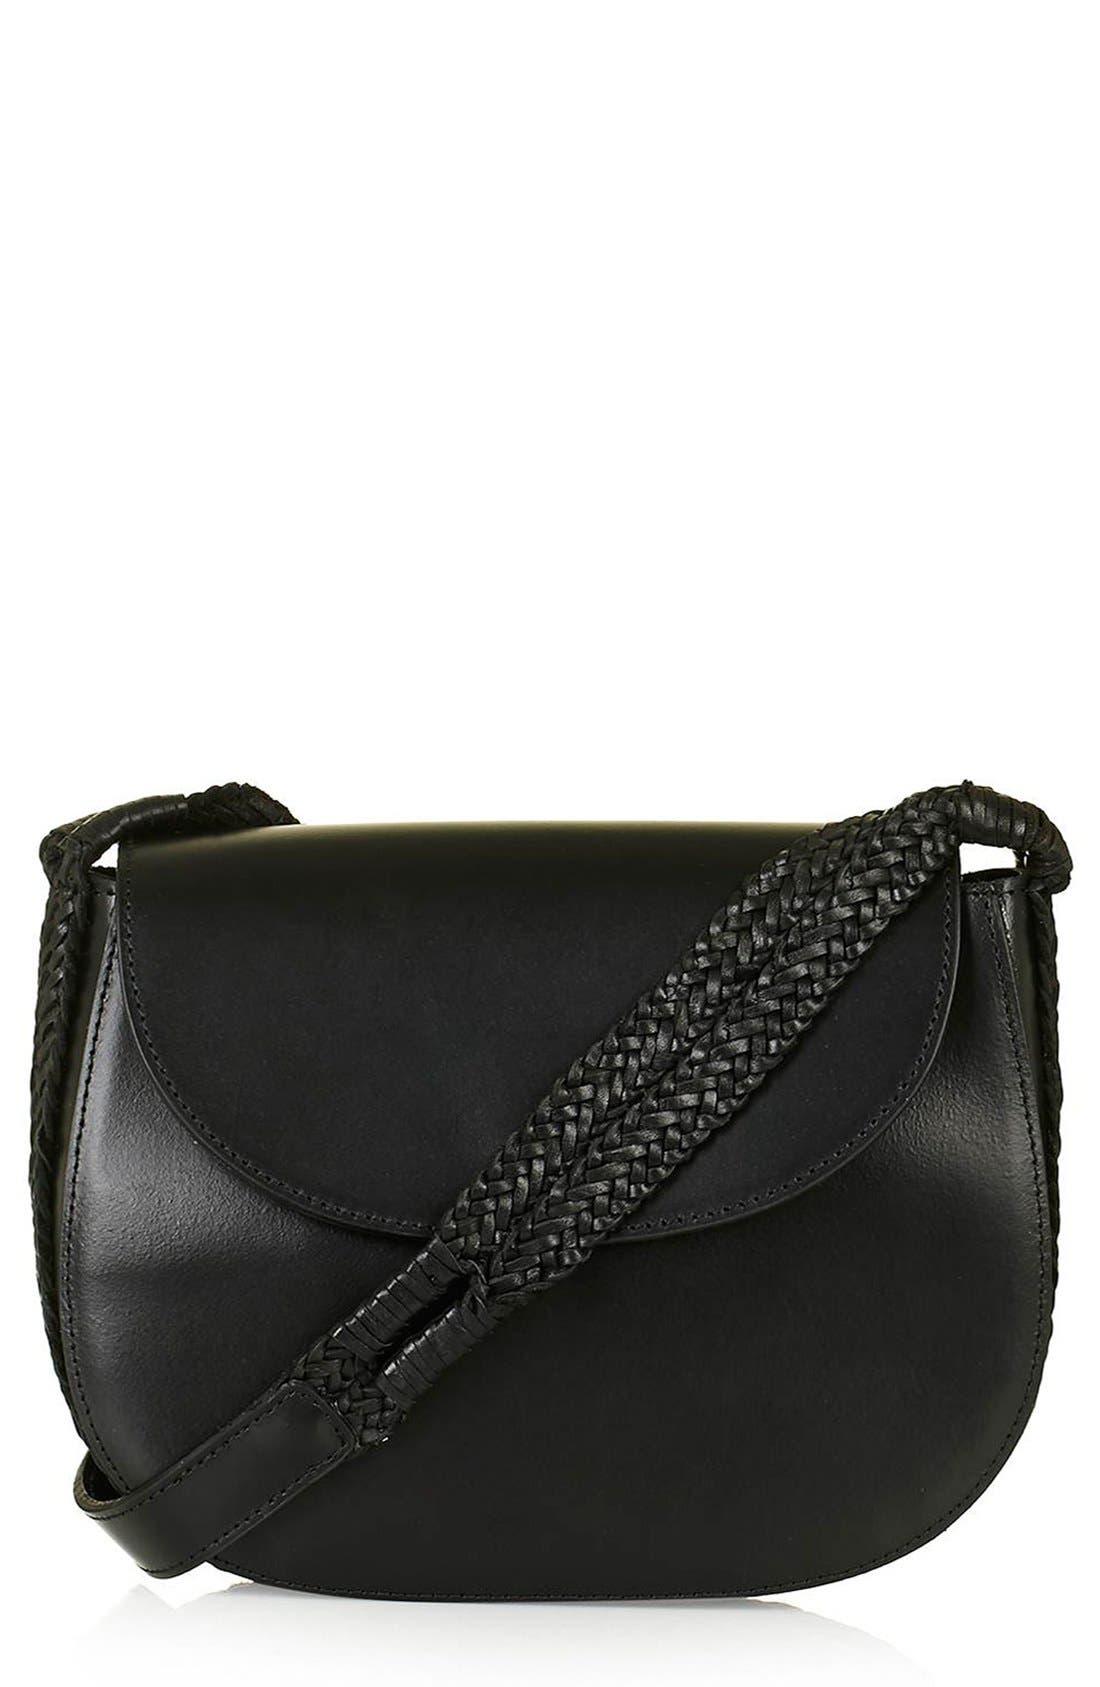 TOPSHOP, Woven Strap Leather Saddle Bag, Main thumbnail 1, color, 001